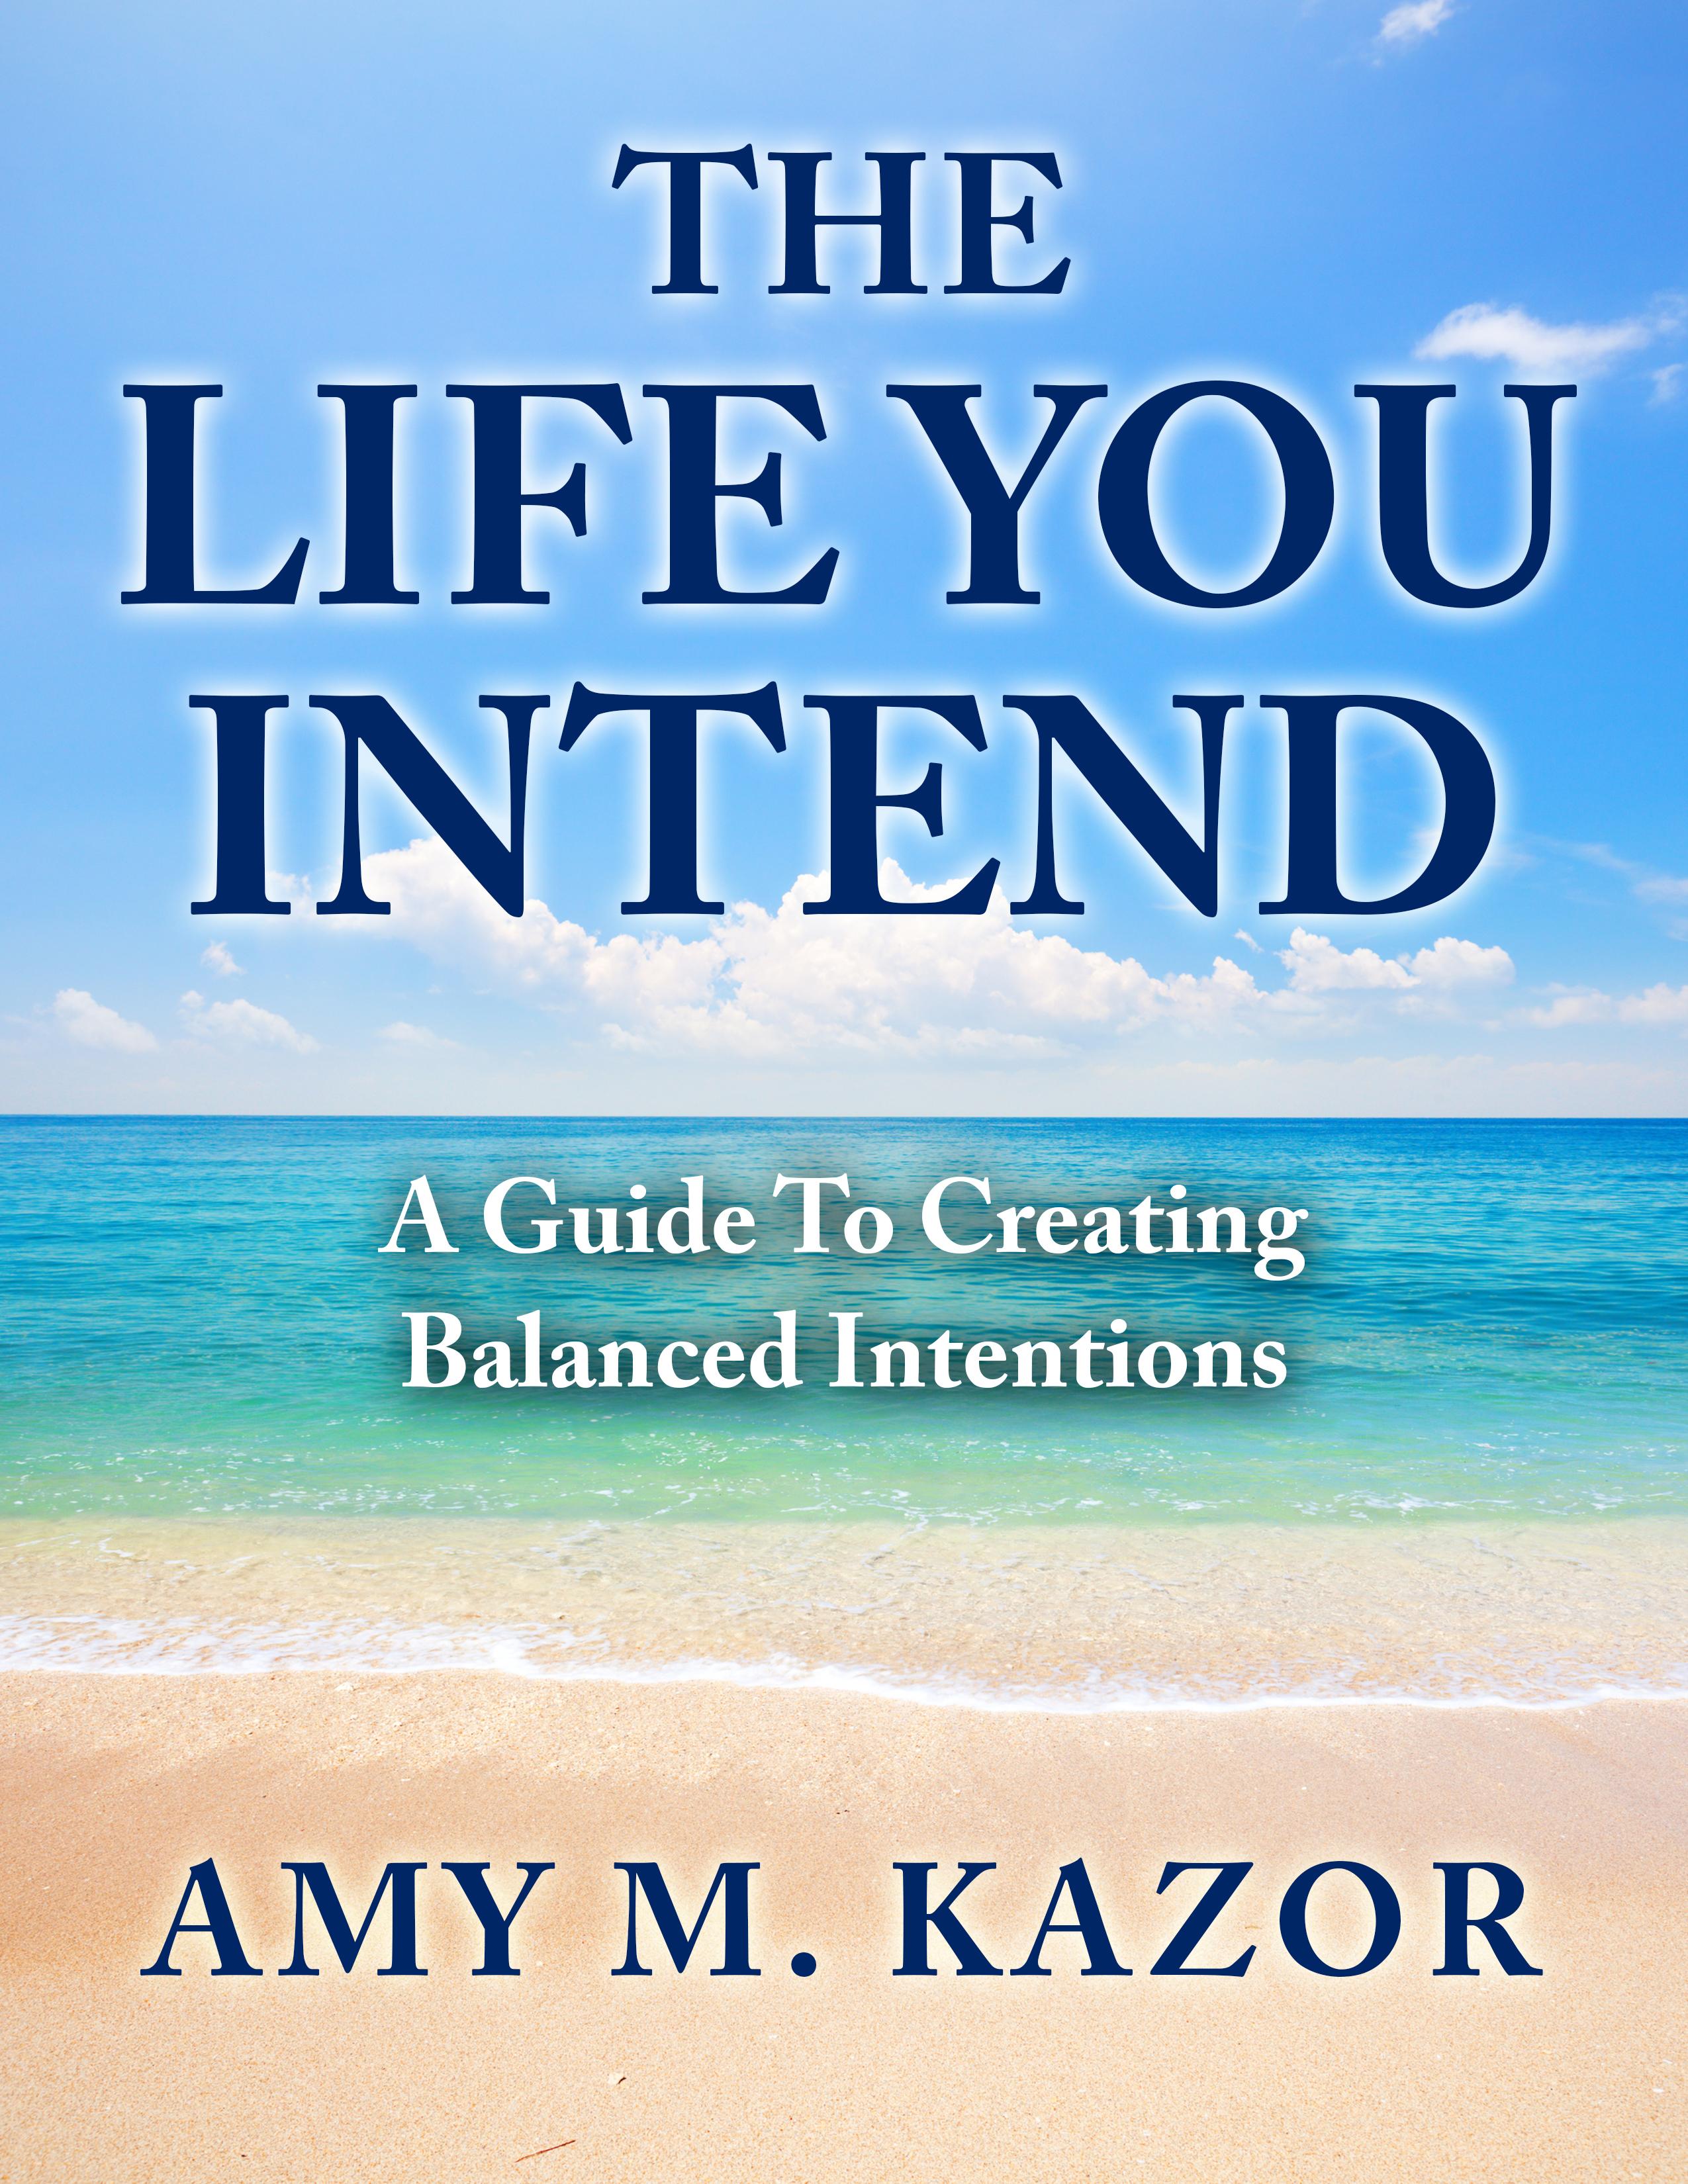 Work Life Balance: Do You Have the Soft Skills?